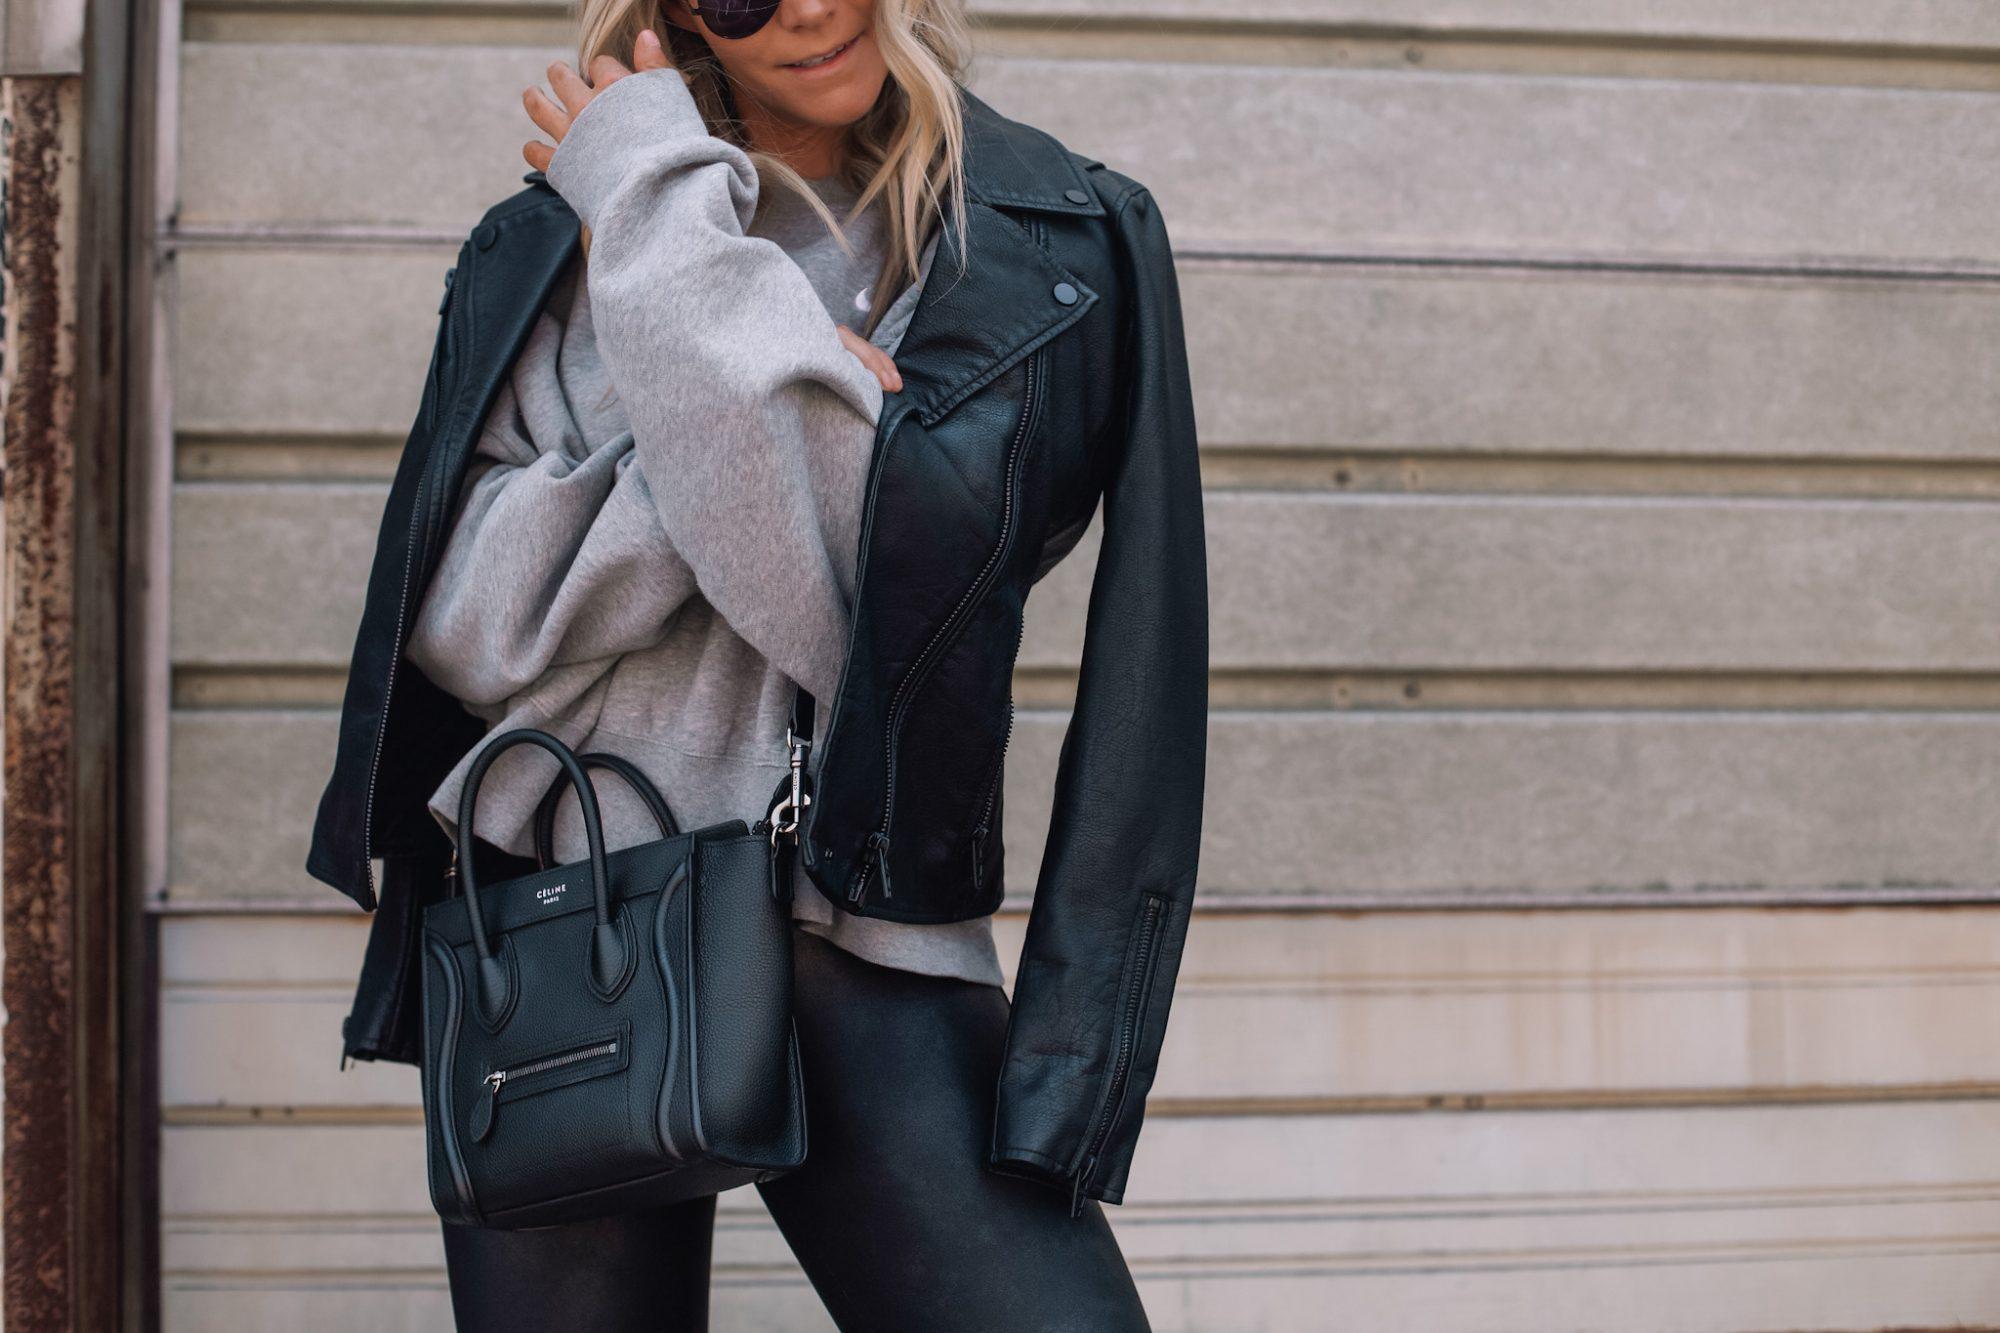 Faux Leather Leggings - Fall Outfit Idea- Athleisure- Ashley Pletcher- Faux Leather Jacket